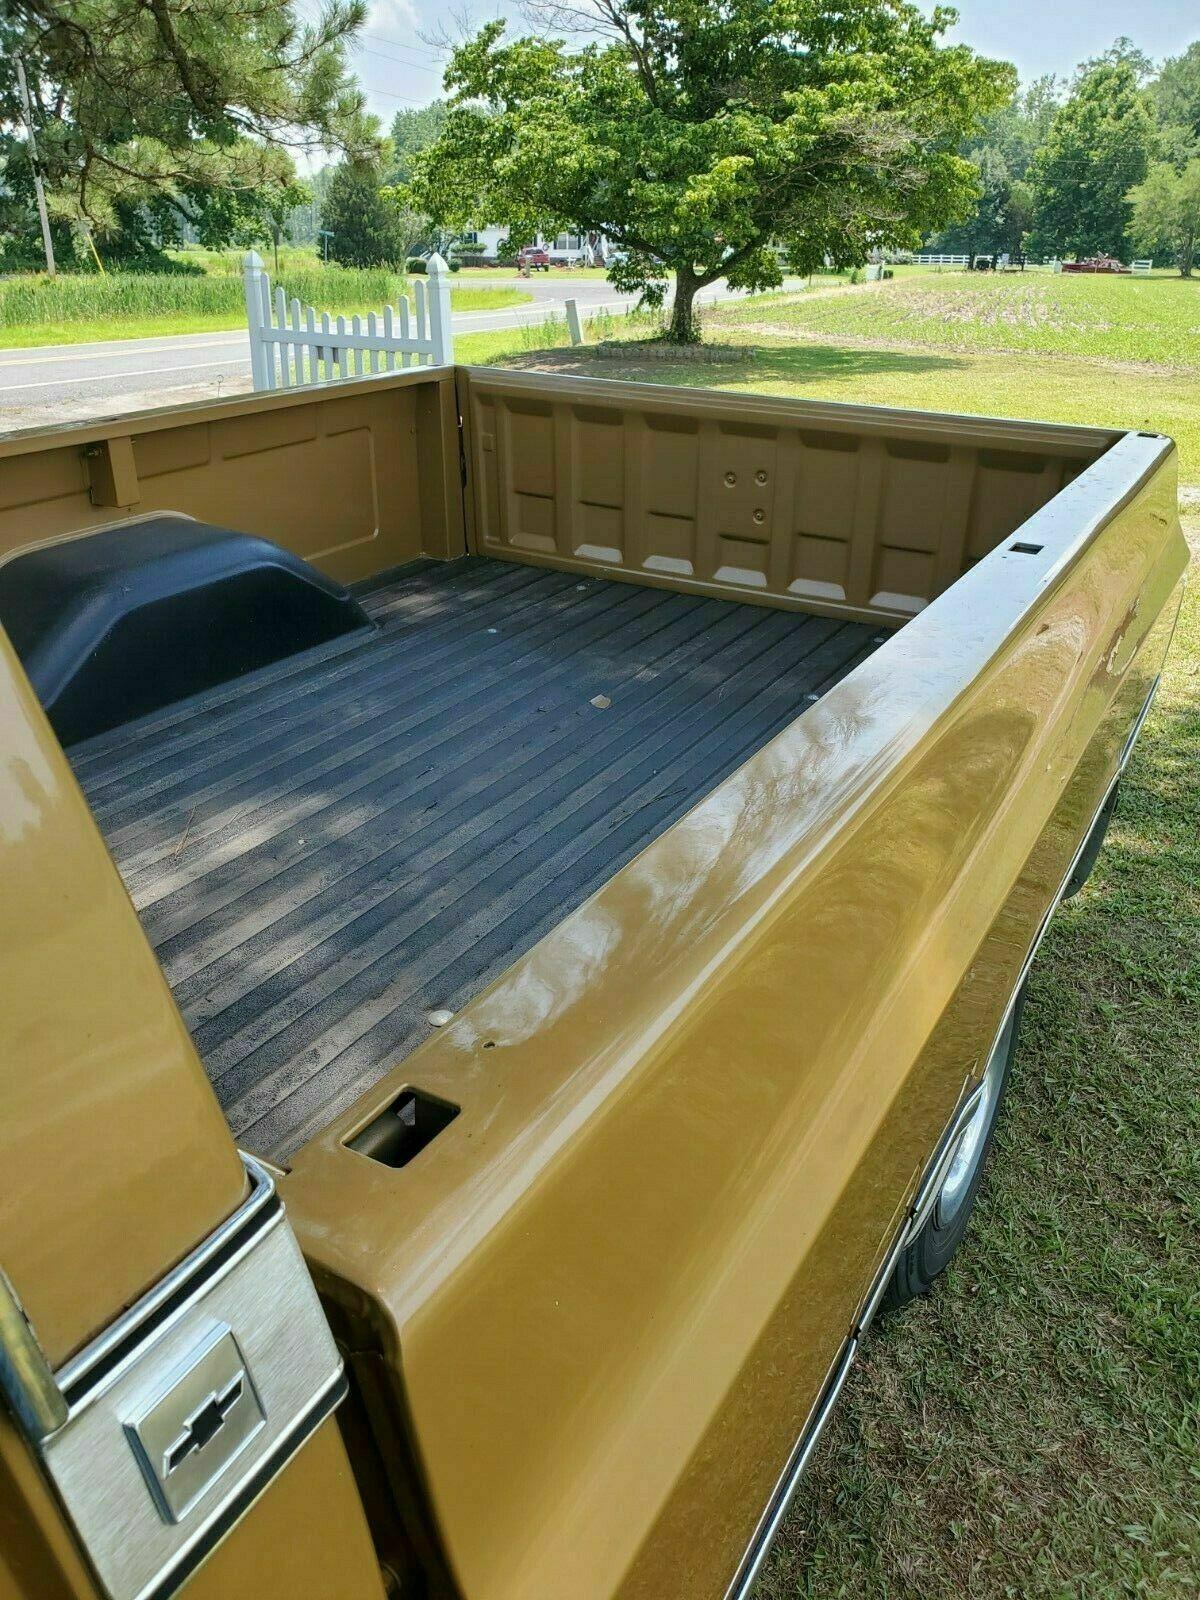 1986 Chevrolet C-10 bed